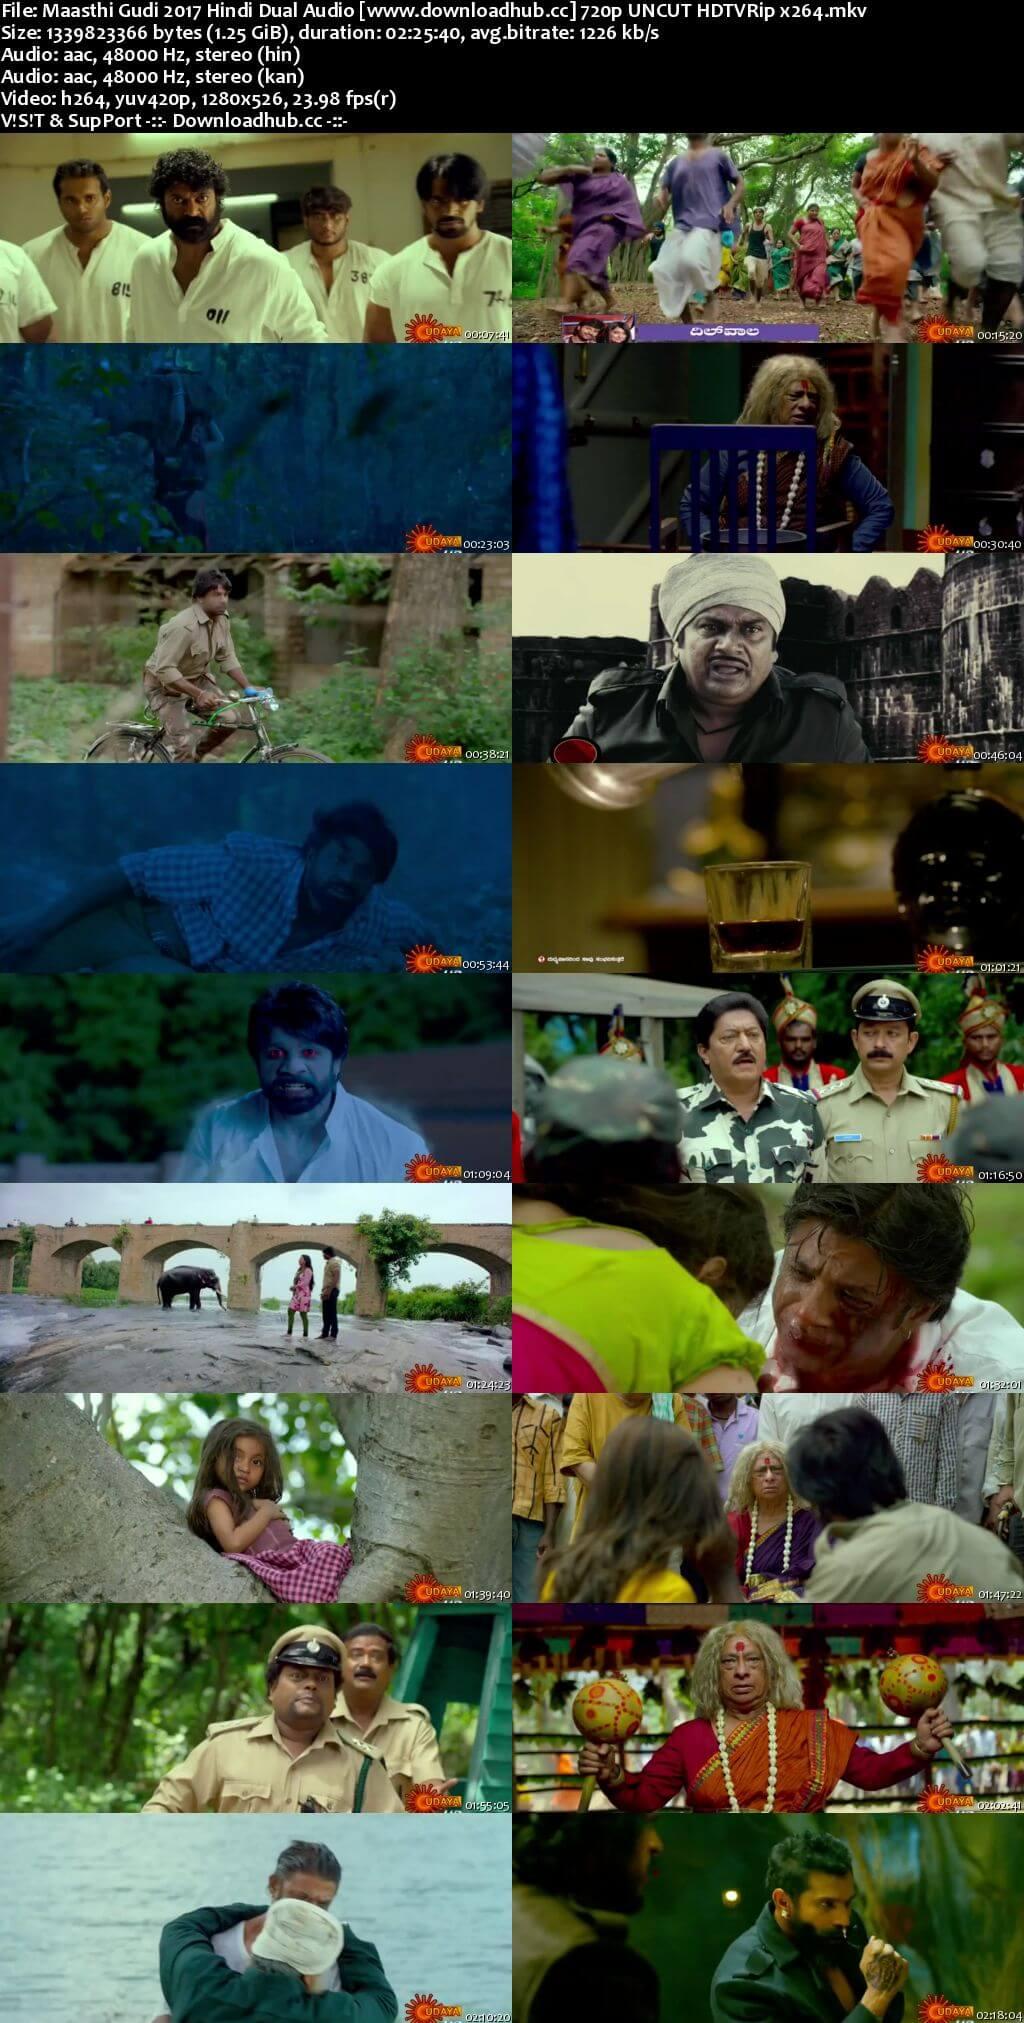 Maasthi Gudi 2017 Hindi Dual Audio 720p UNCUT HDTVRip x264